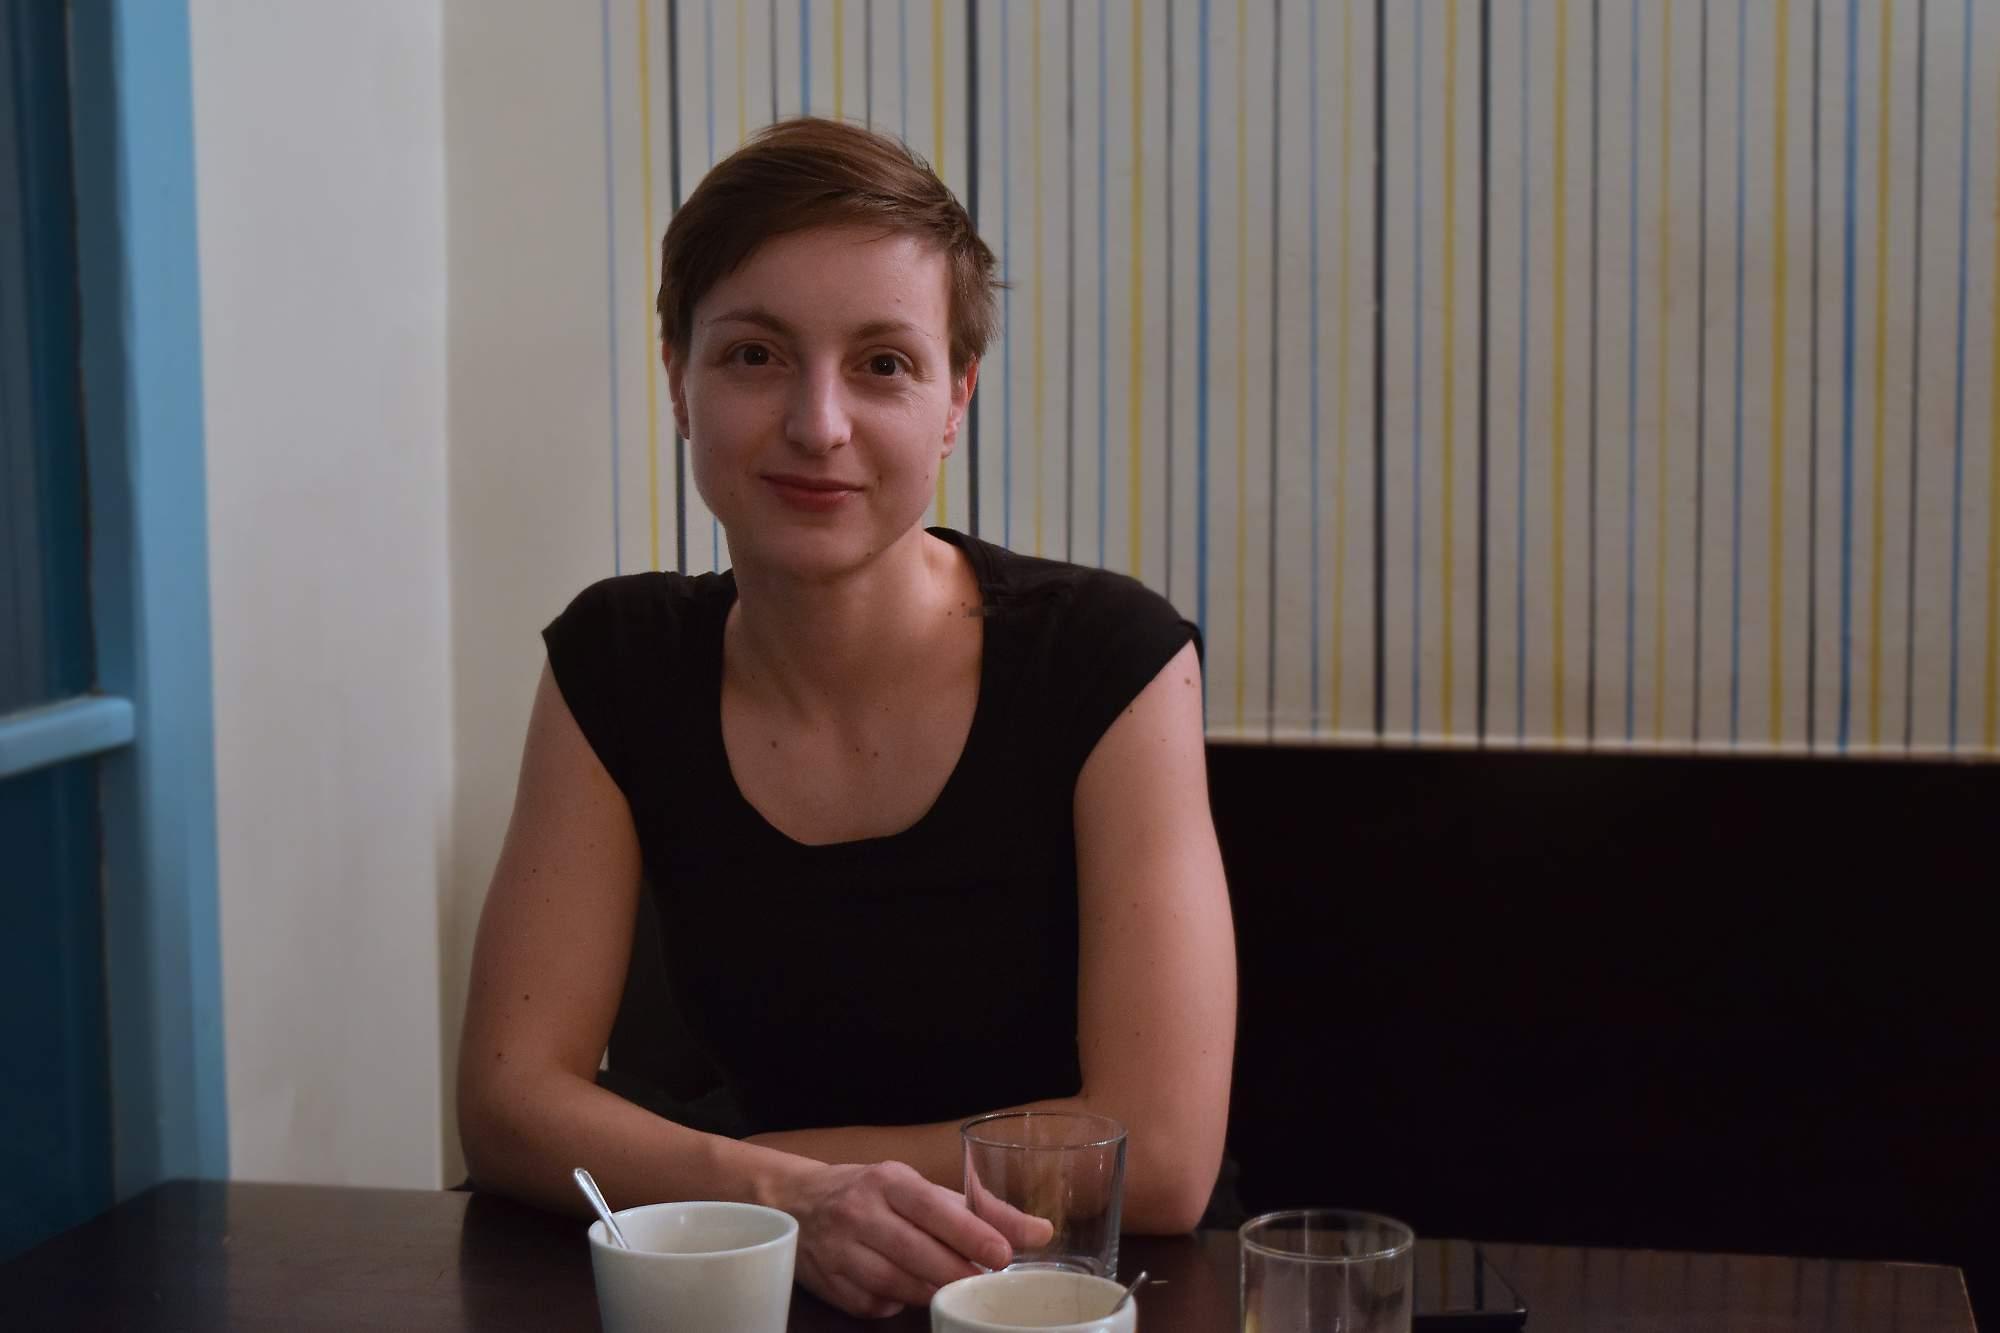 Organizátorka Týdne výtvarné kultury Irena Rodriguez Točíková. Foto: Lenka Jebáčková